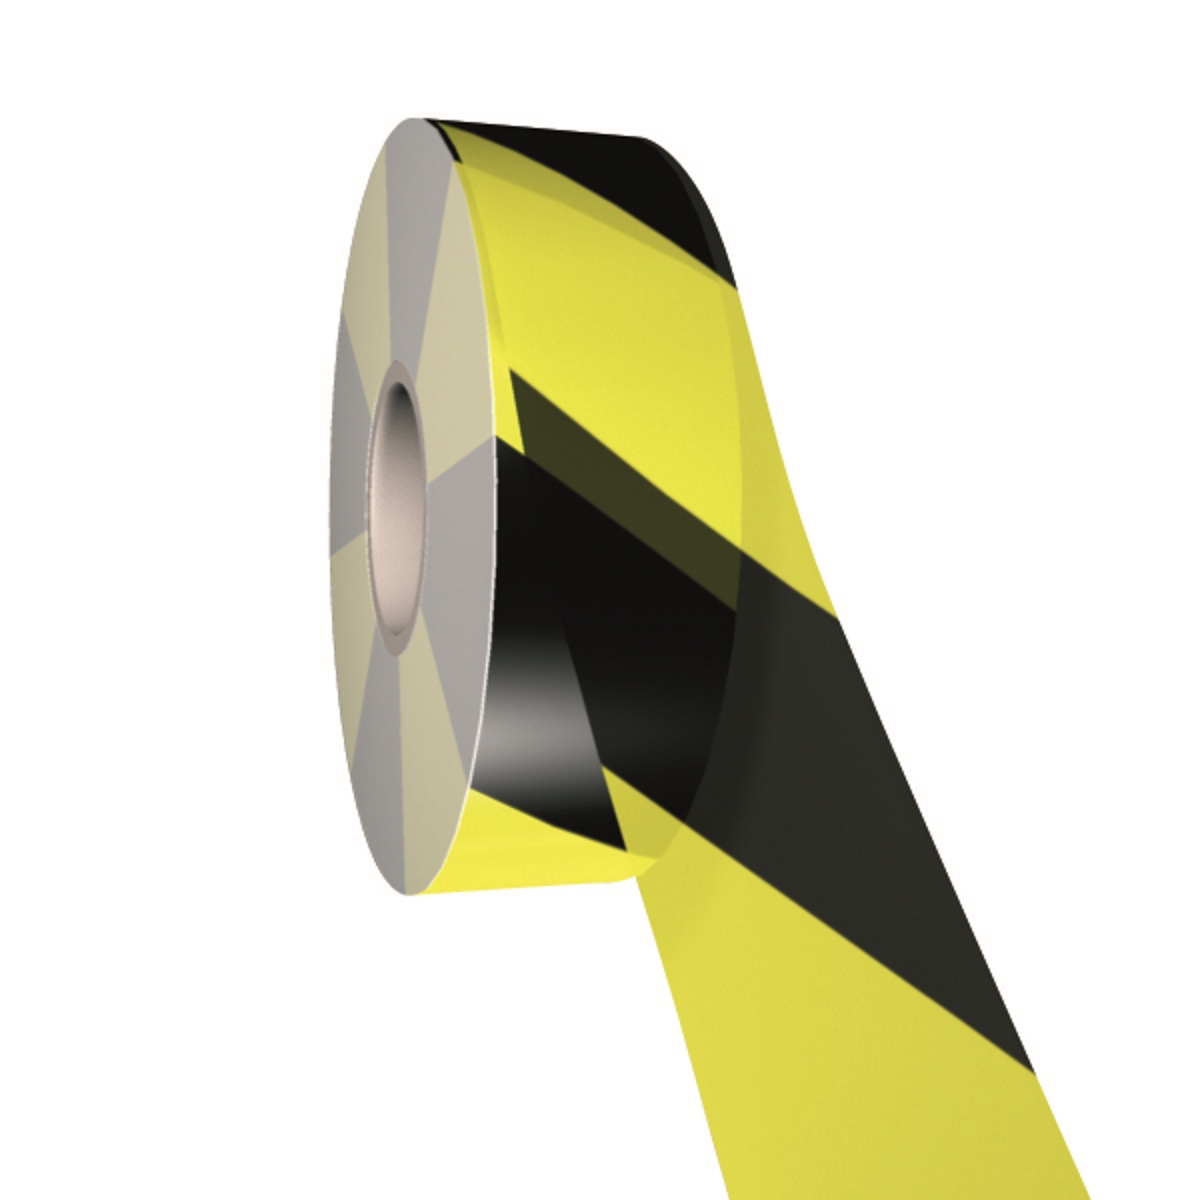 WP0760_Self Adhesive Hazard Warning Tape Roll